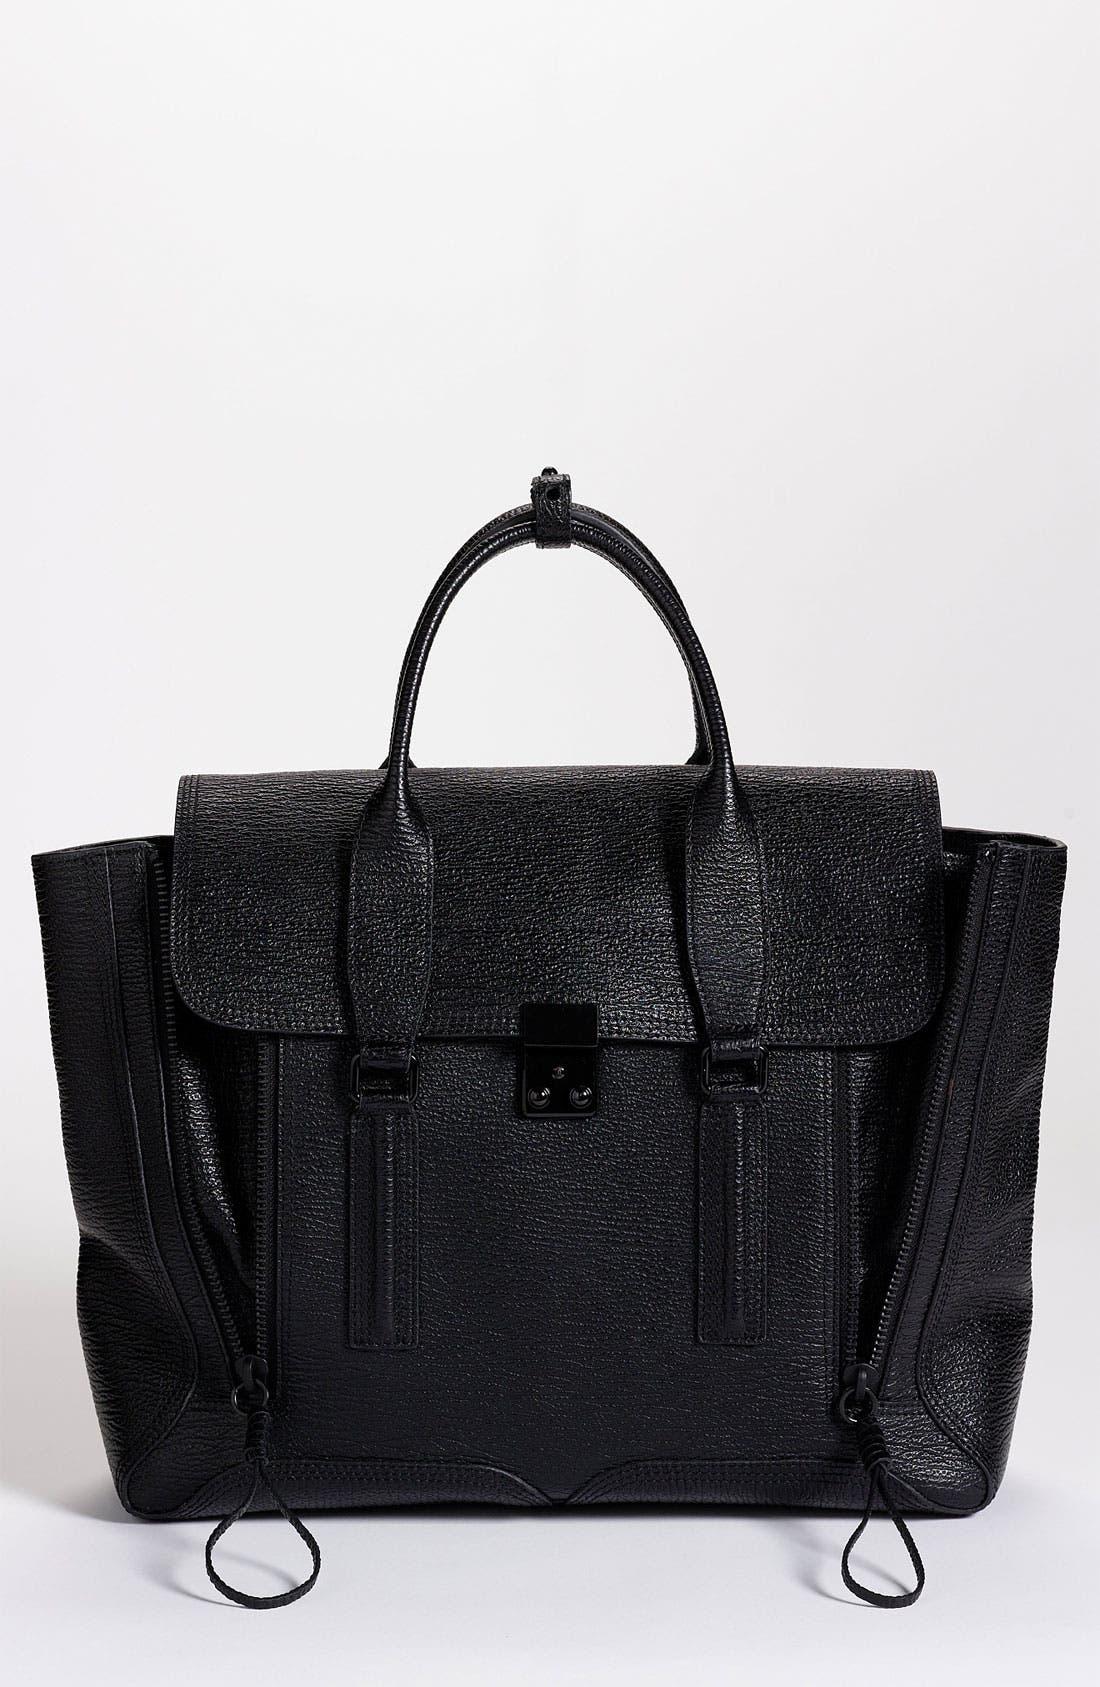 Alternate Image 1 Selected - 3.1 Phillip Lim 'Pashli' Leather Satchel